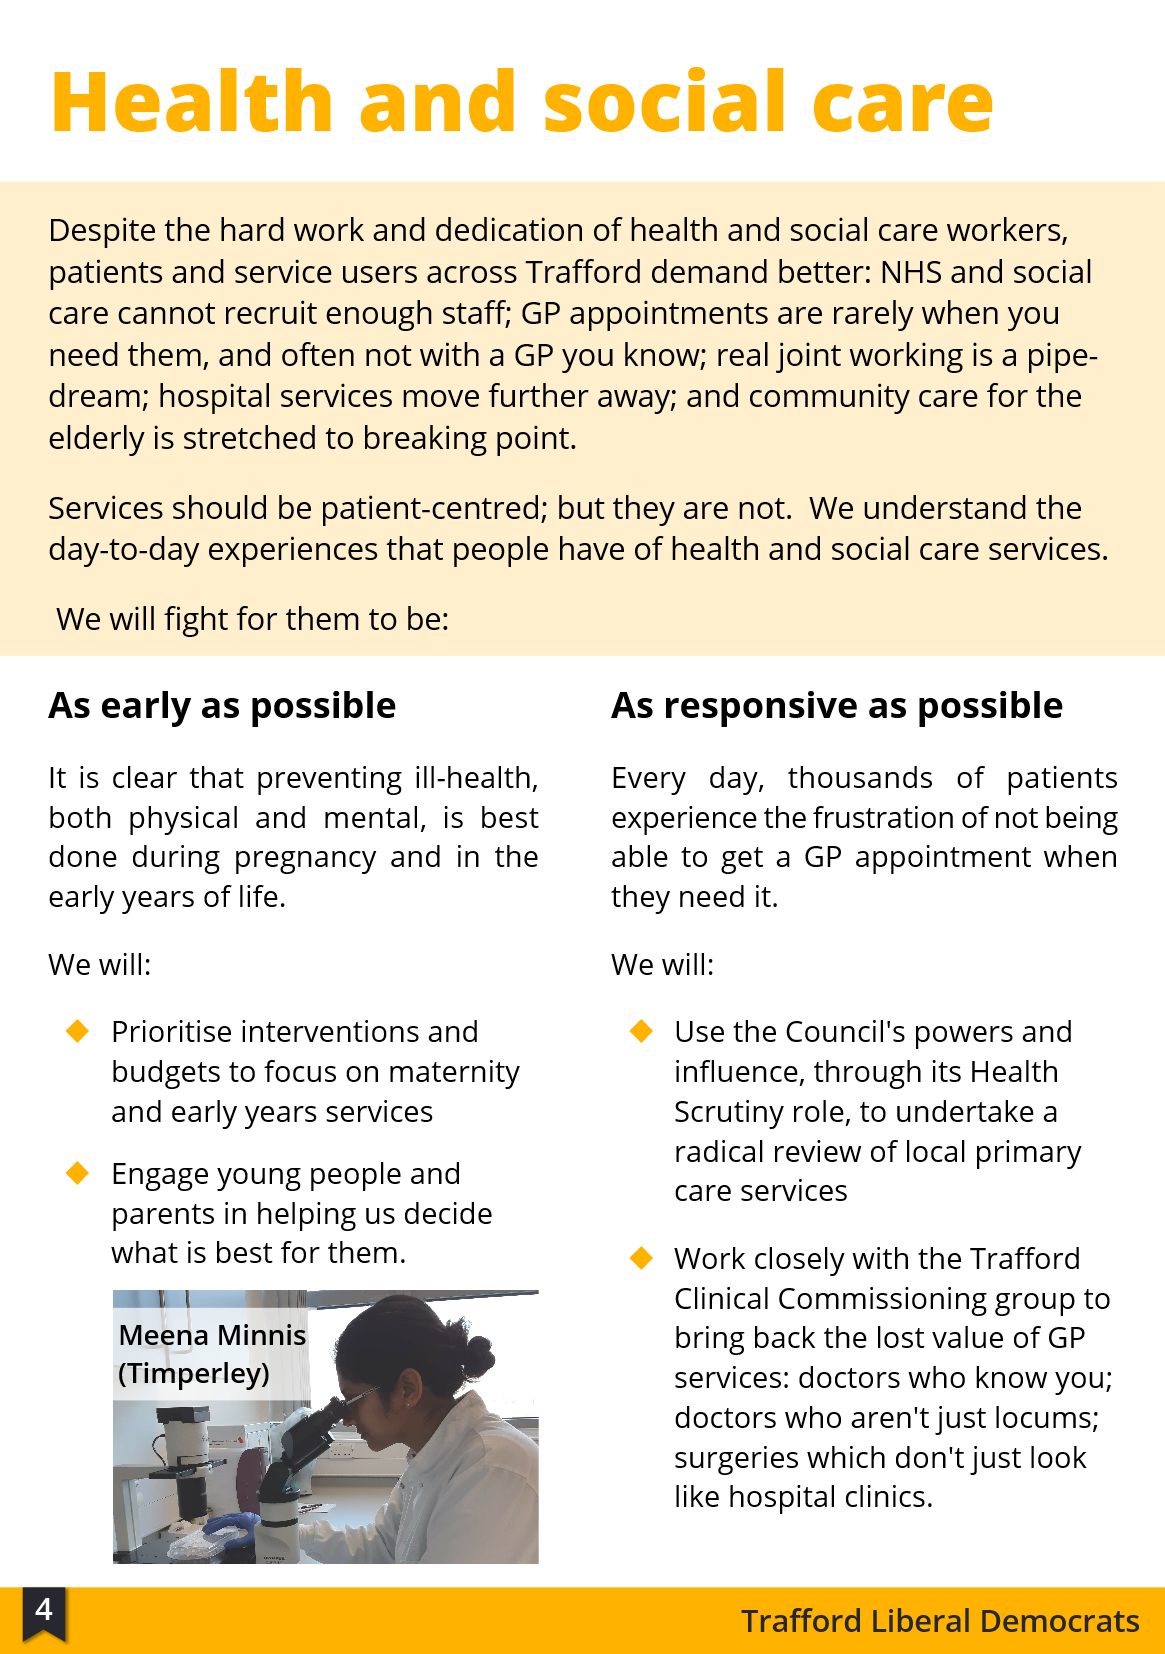 2019-LD-Manifesto03.png